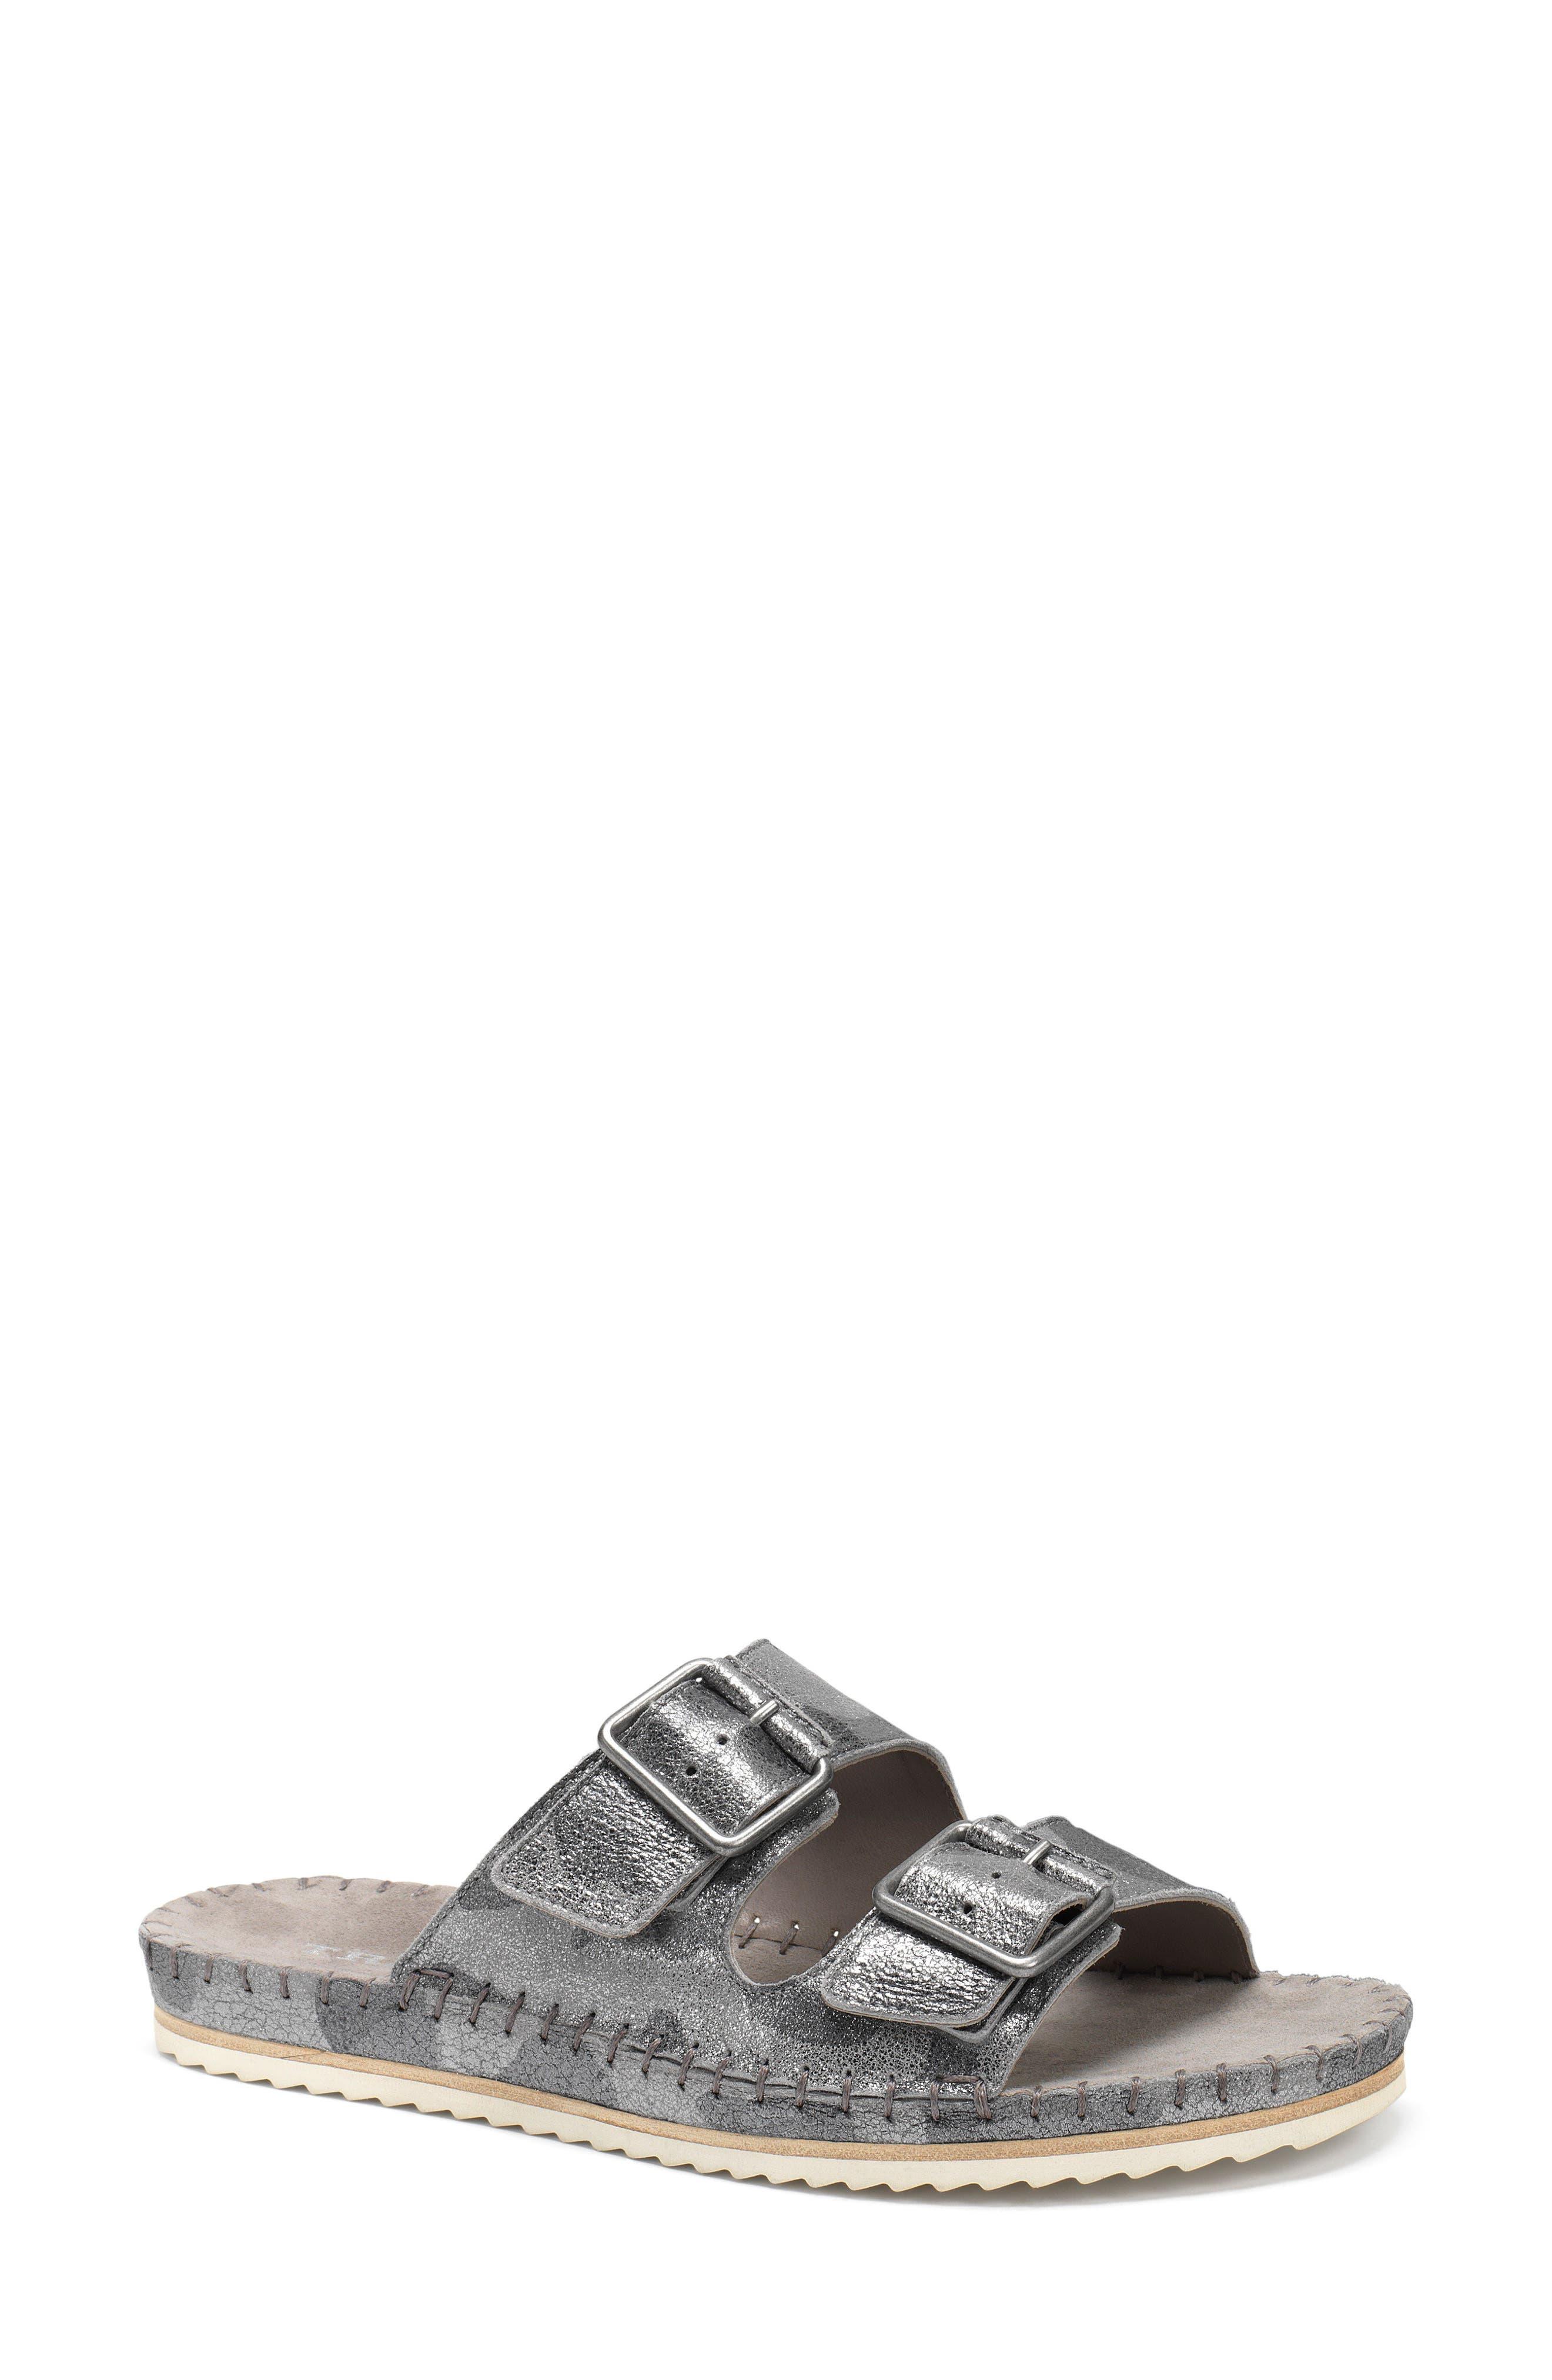 Trask Carli Camo Metallic Suede Slide Sandals BgfOTw67N